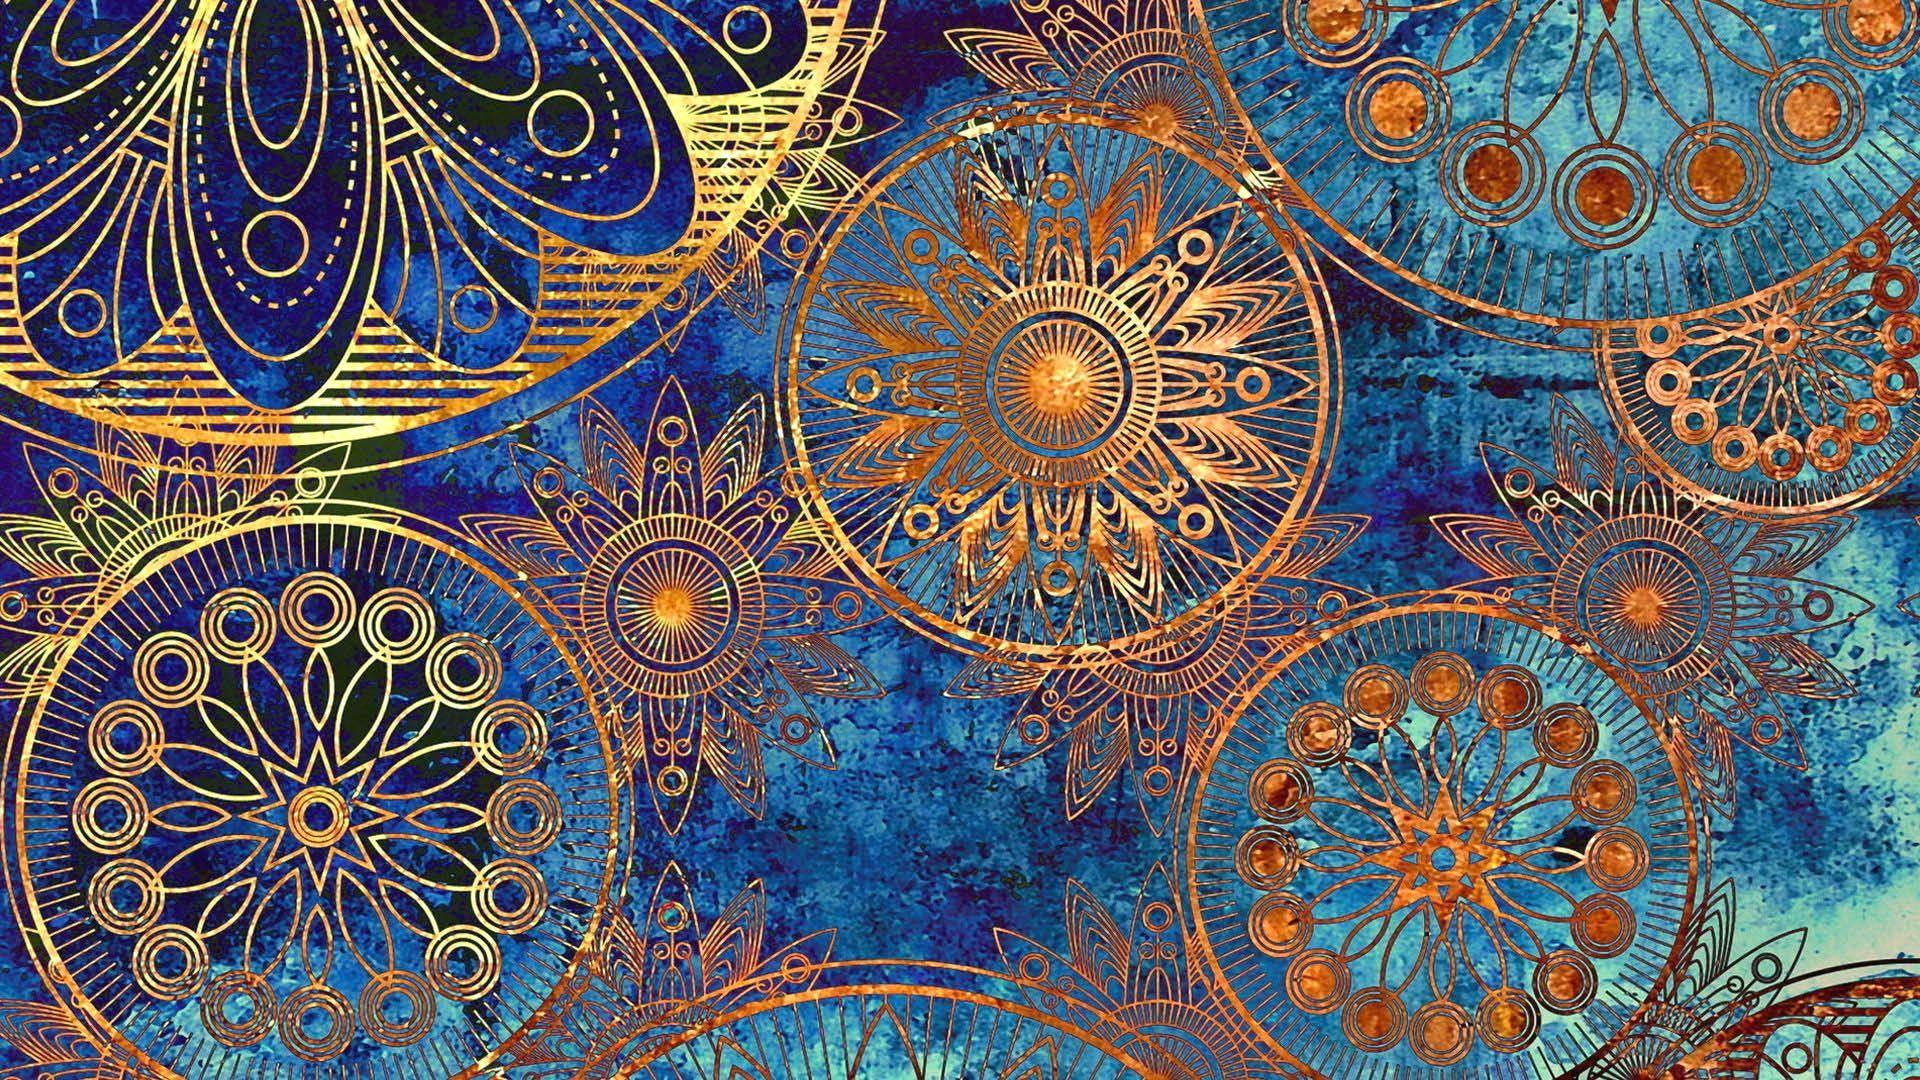 Geniale Inspiration Tapete Art Deco Und Angenehme Wallpaper Hd Art Deco Wallpaper Wallpapers Vintage Desktop Wallpaper Art